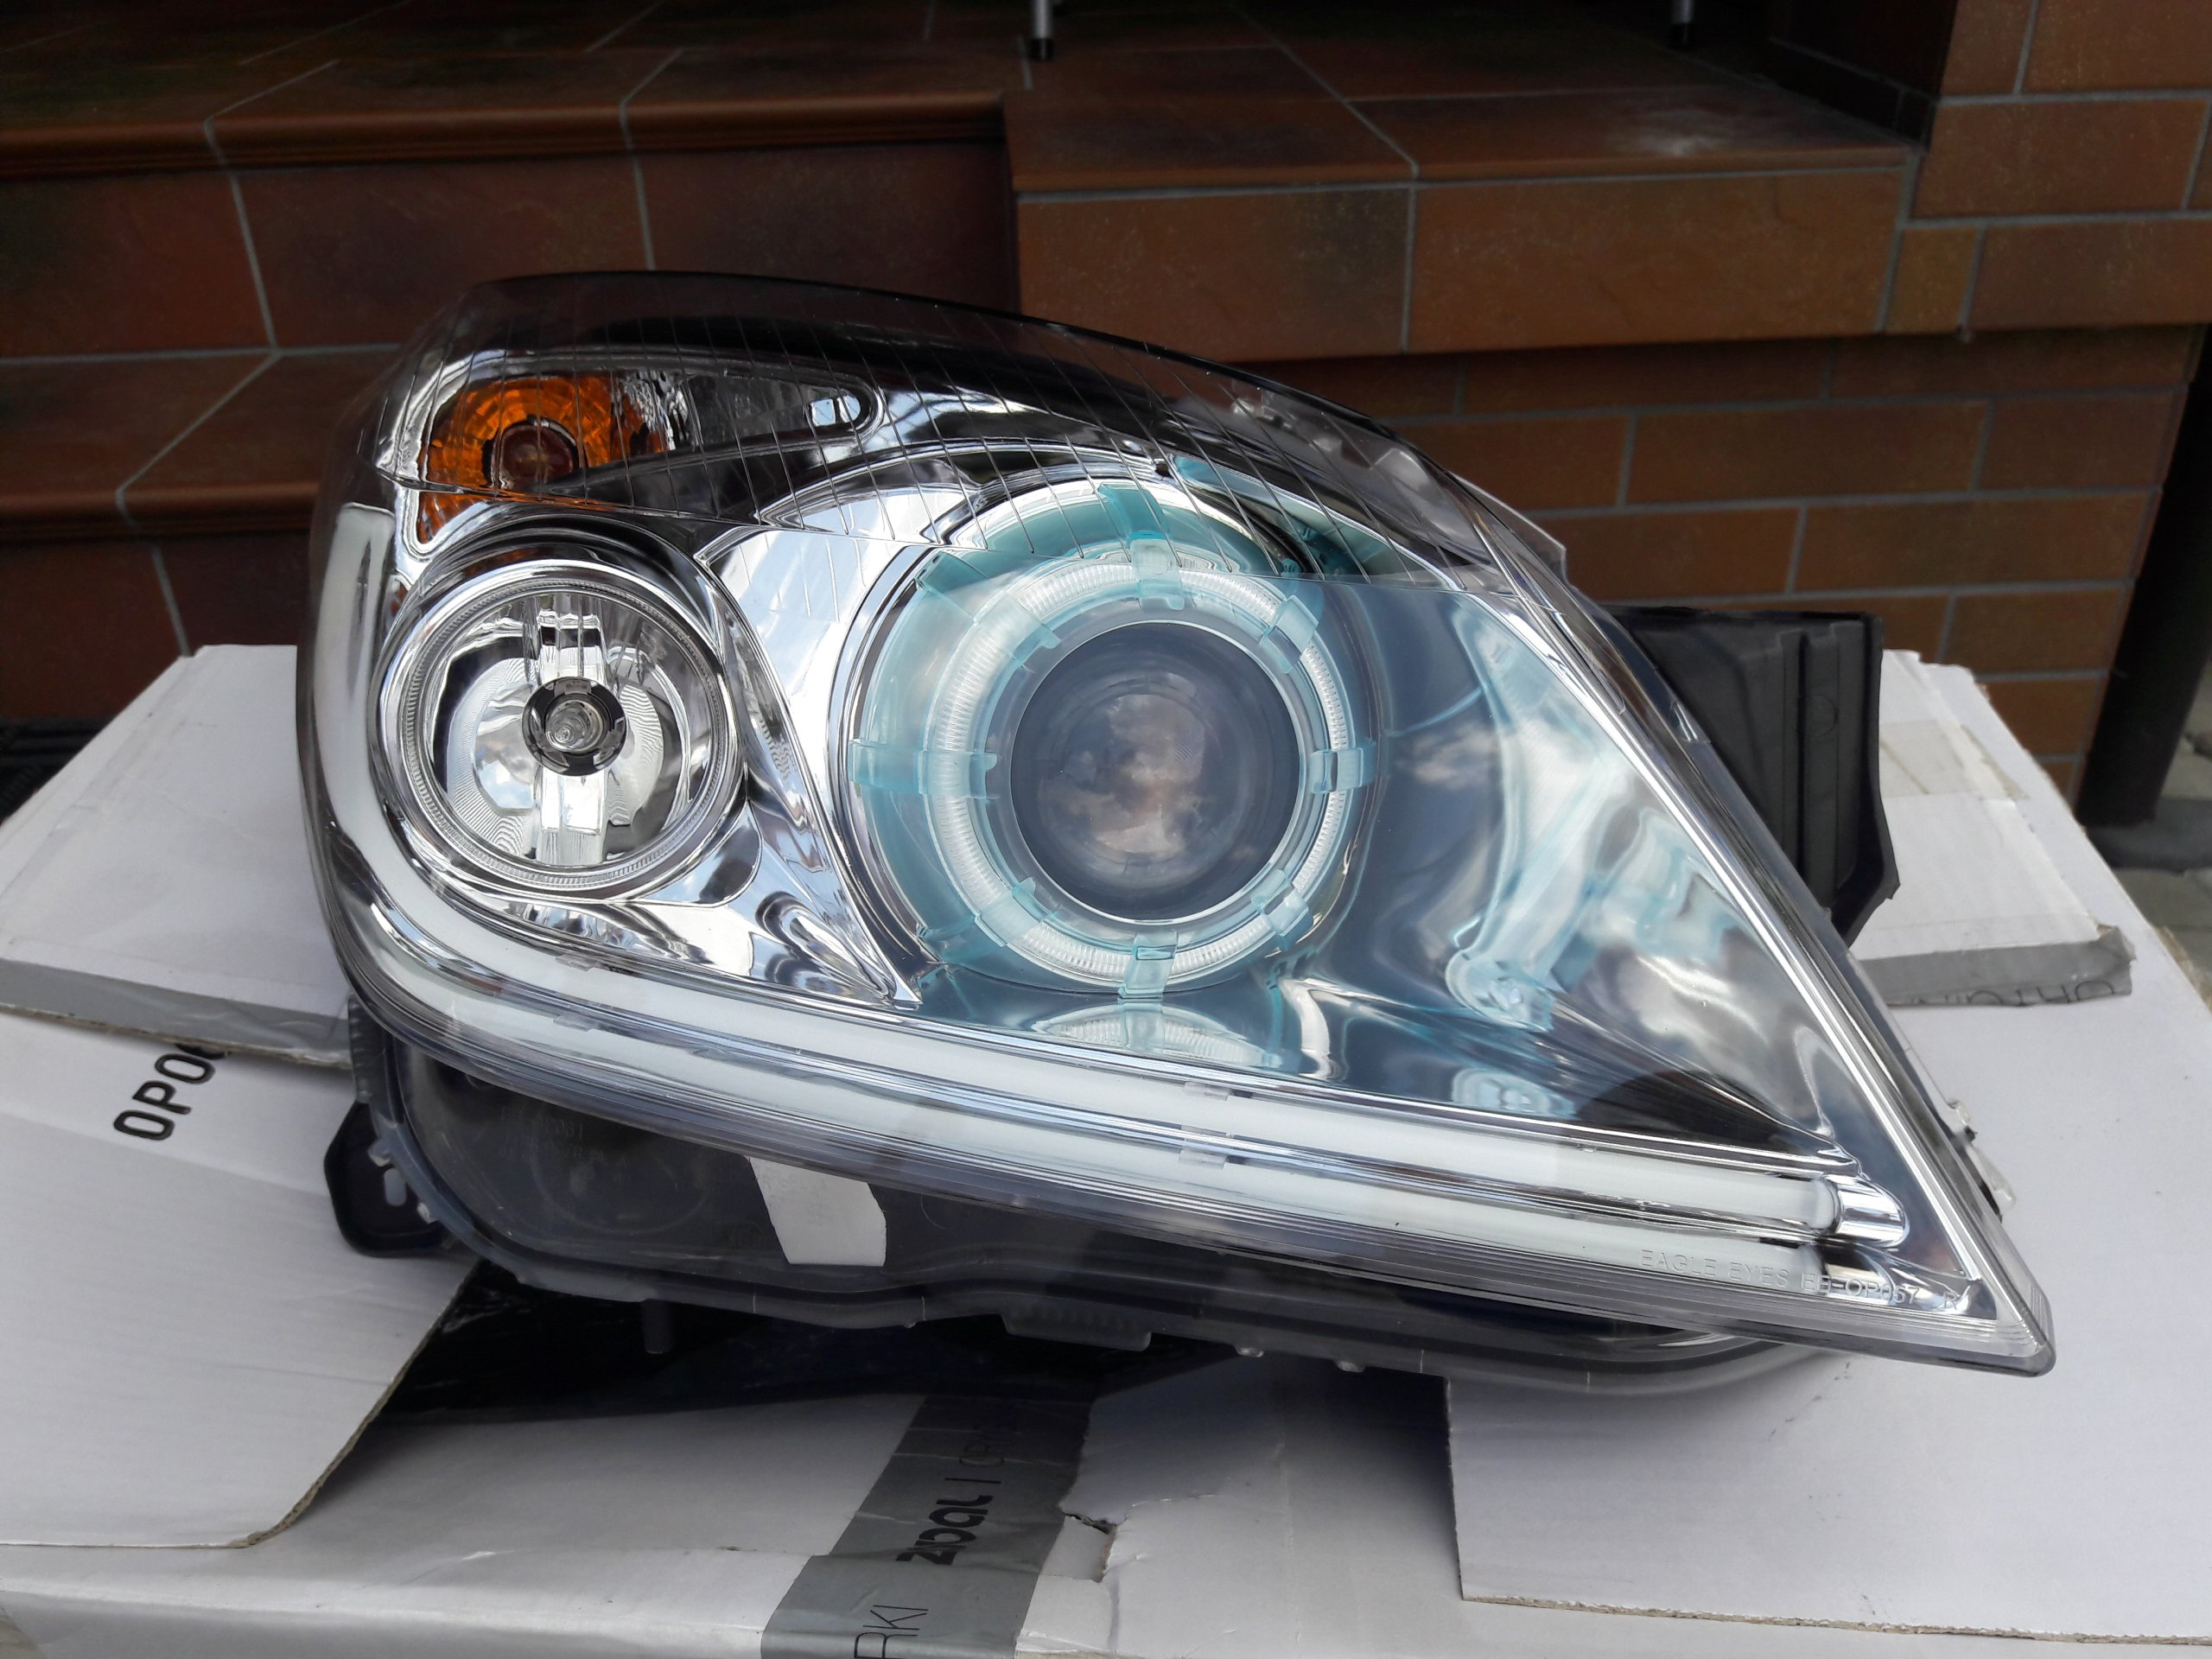 Lampy Przód Opel Astra Iii Xenon Led Pl 7459060997